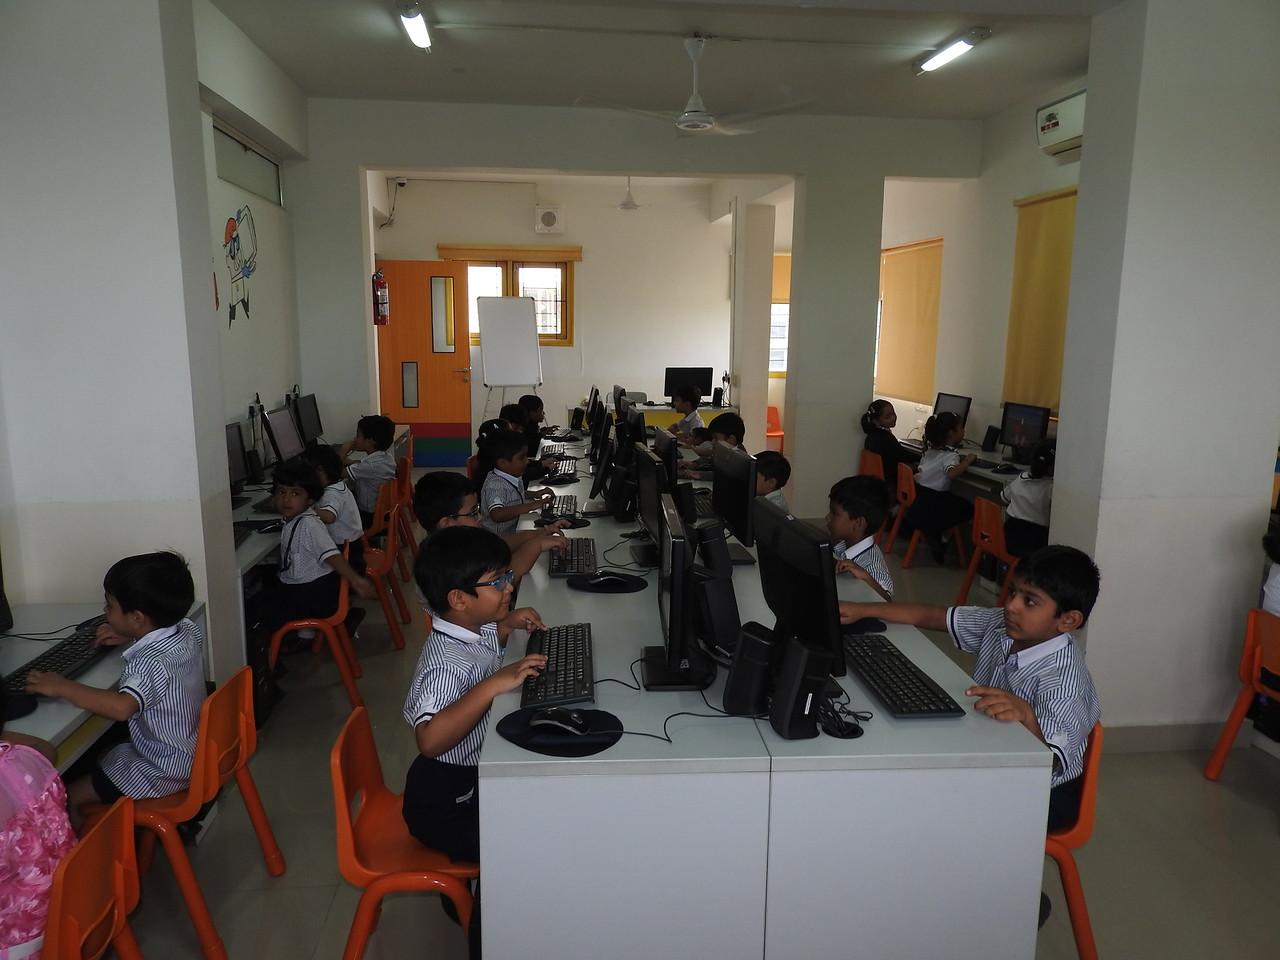 WE ENJOY WORKING ON COMPUTER